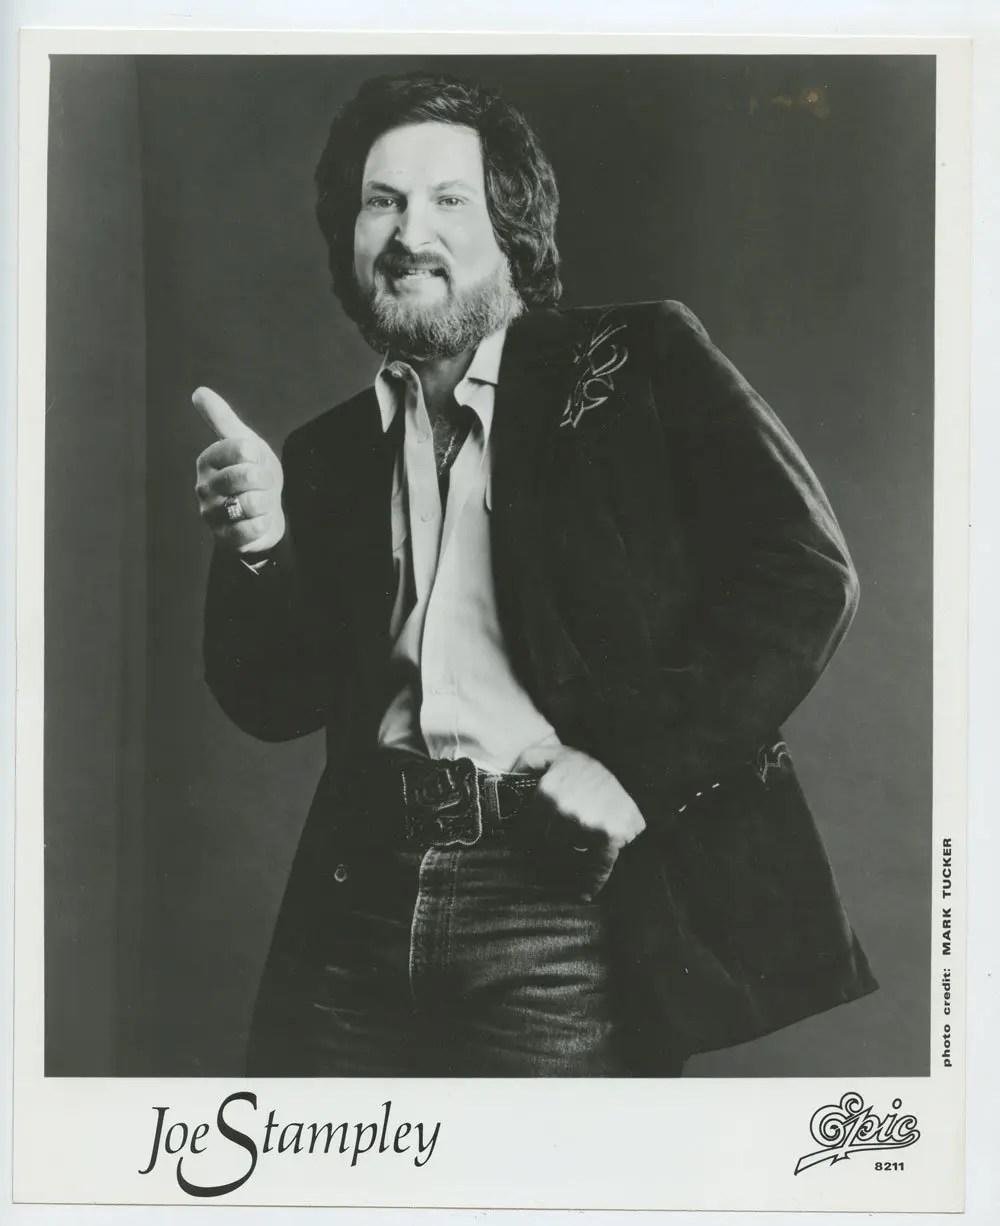 Joe Stampley Photo 1980s Publicity Promo Epic Records